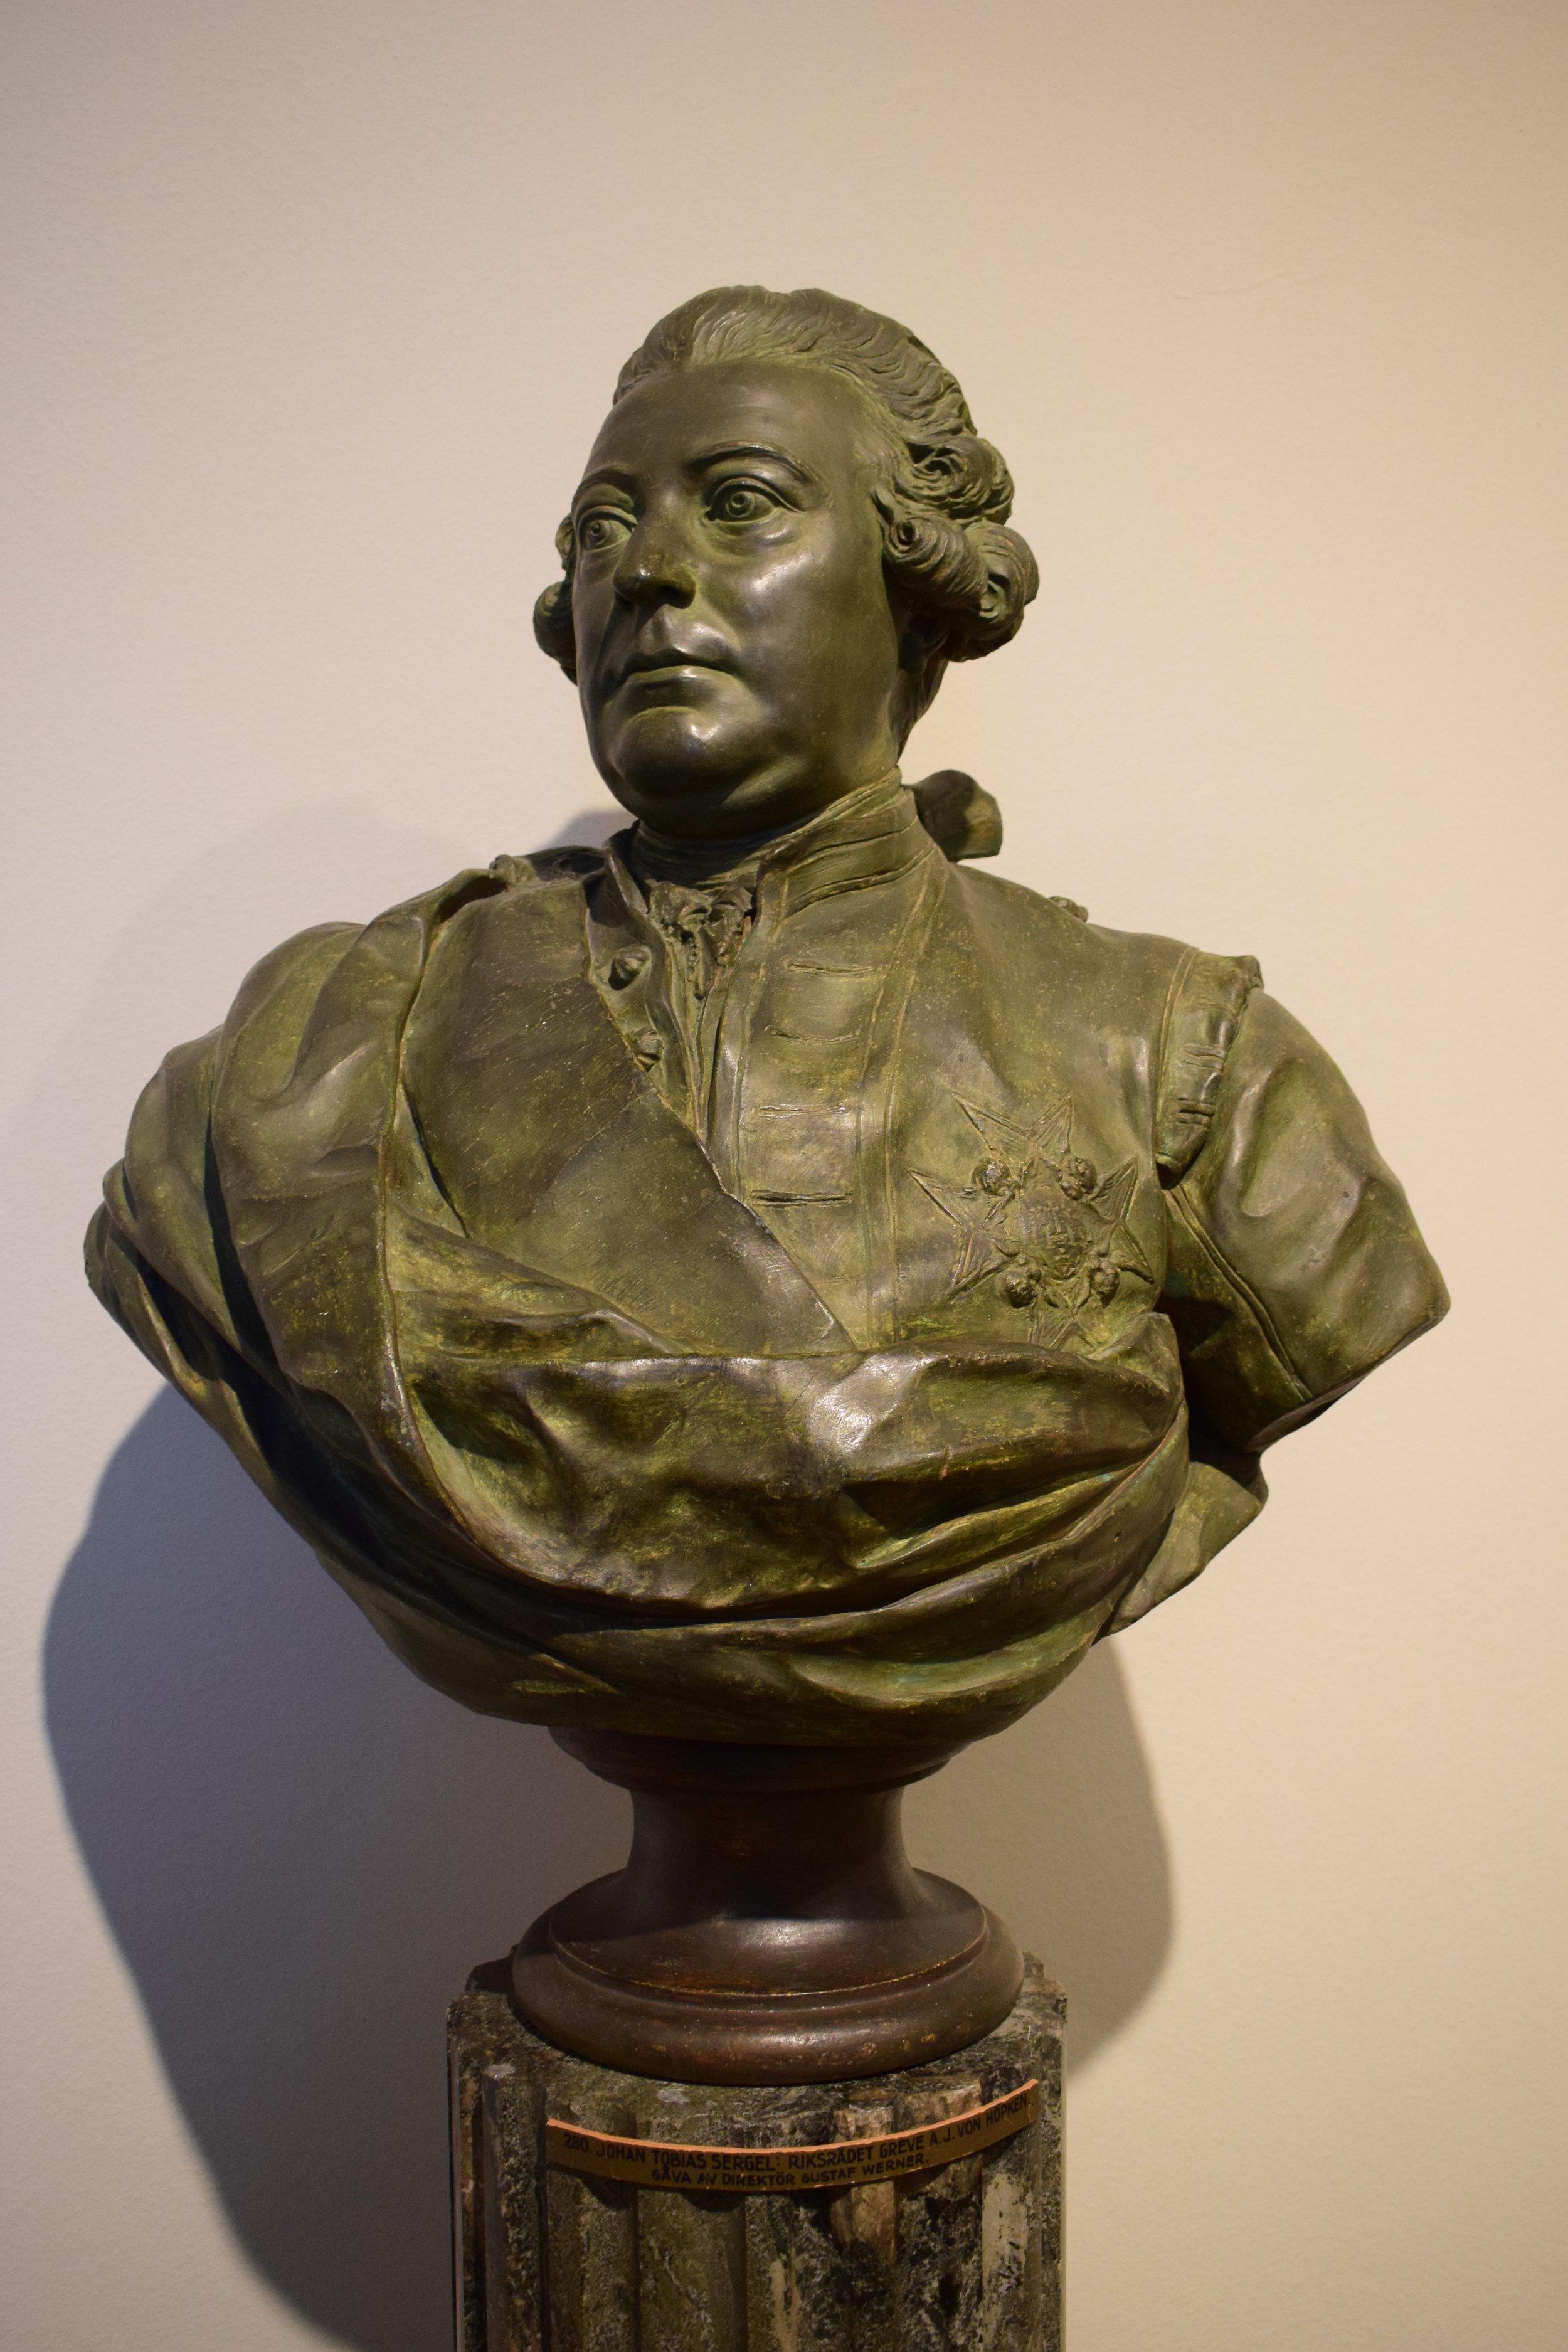 Johan Tobias Sergel, Riksrådet greve Anders Johan von Höpken